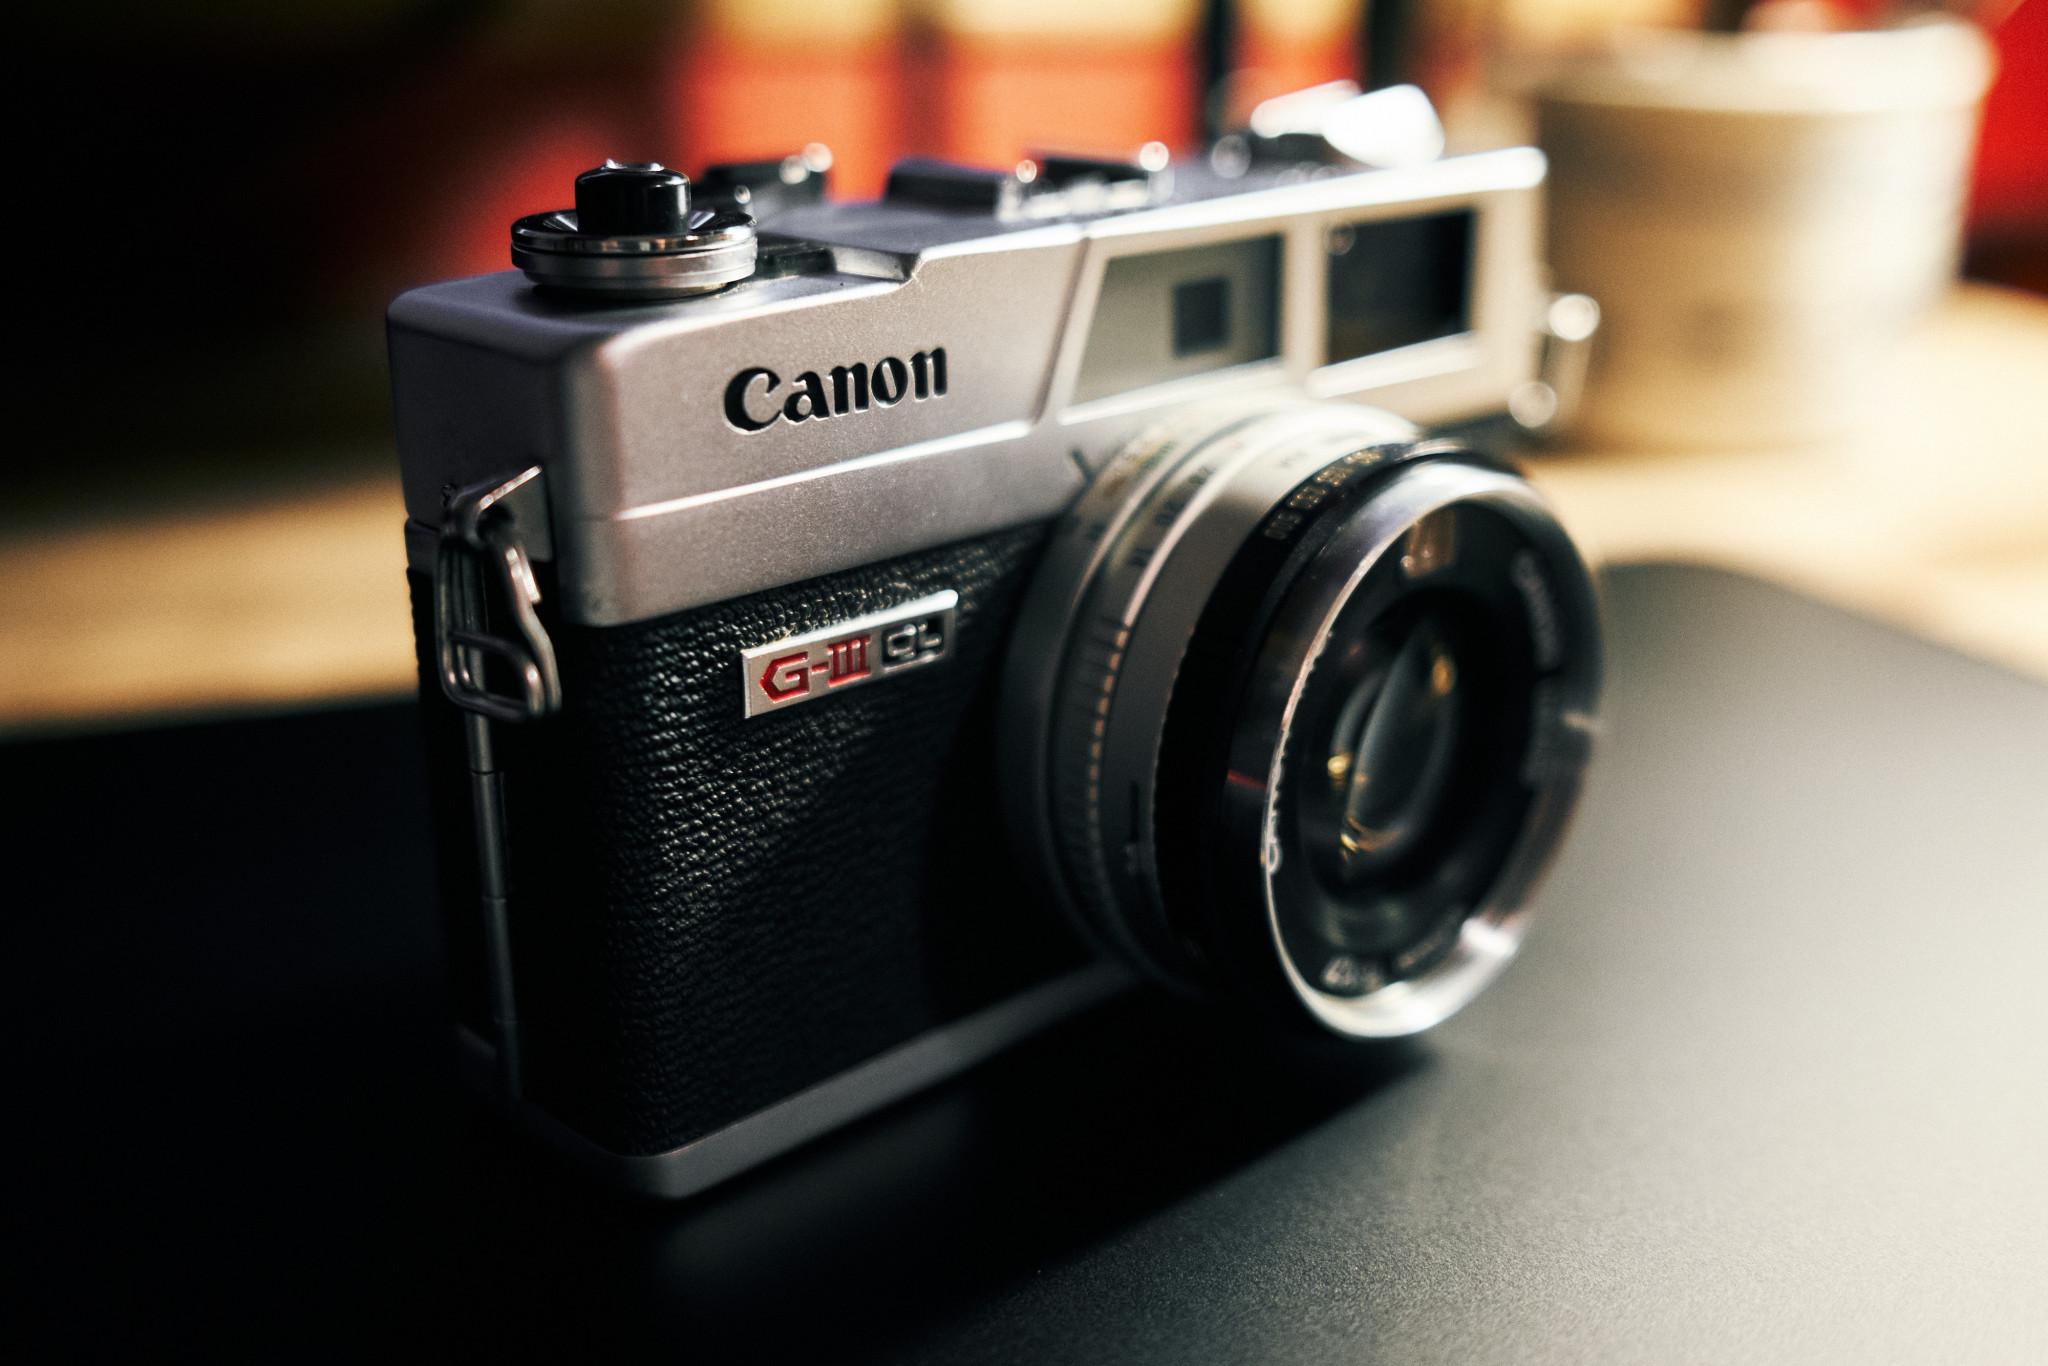 01-Canonet-G-III-17.jpg